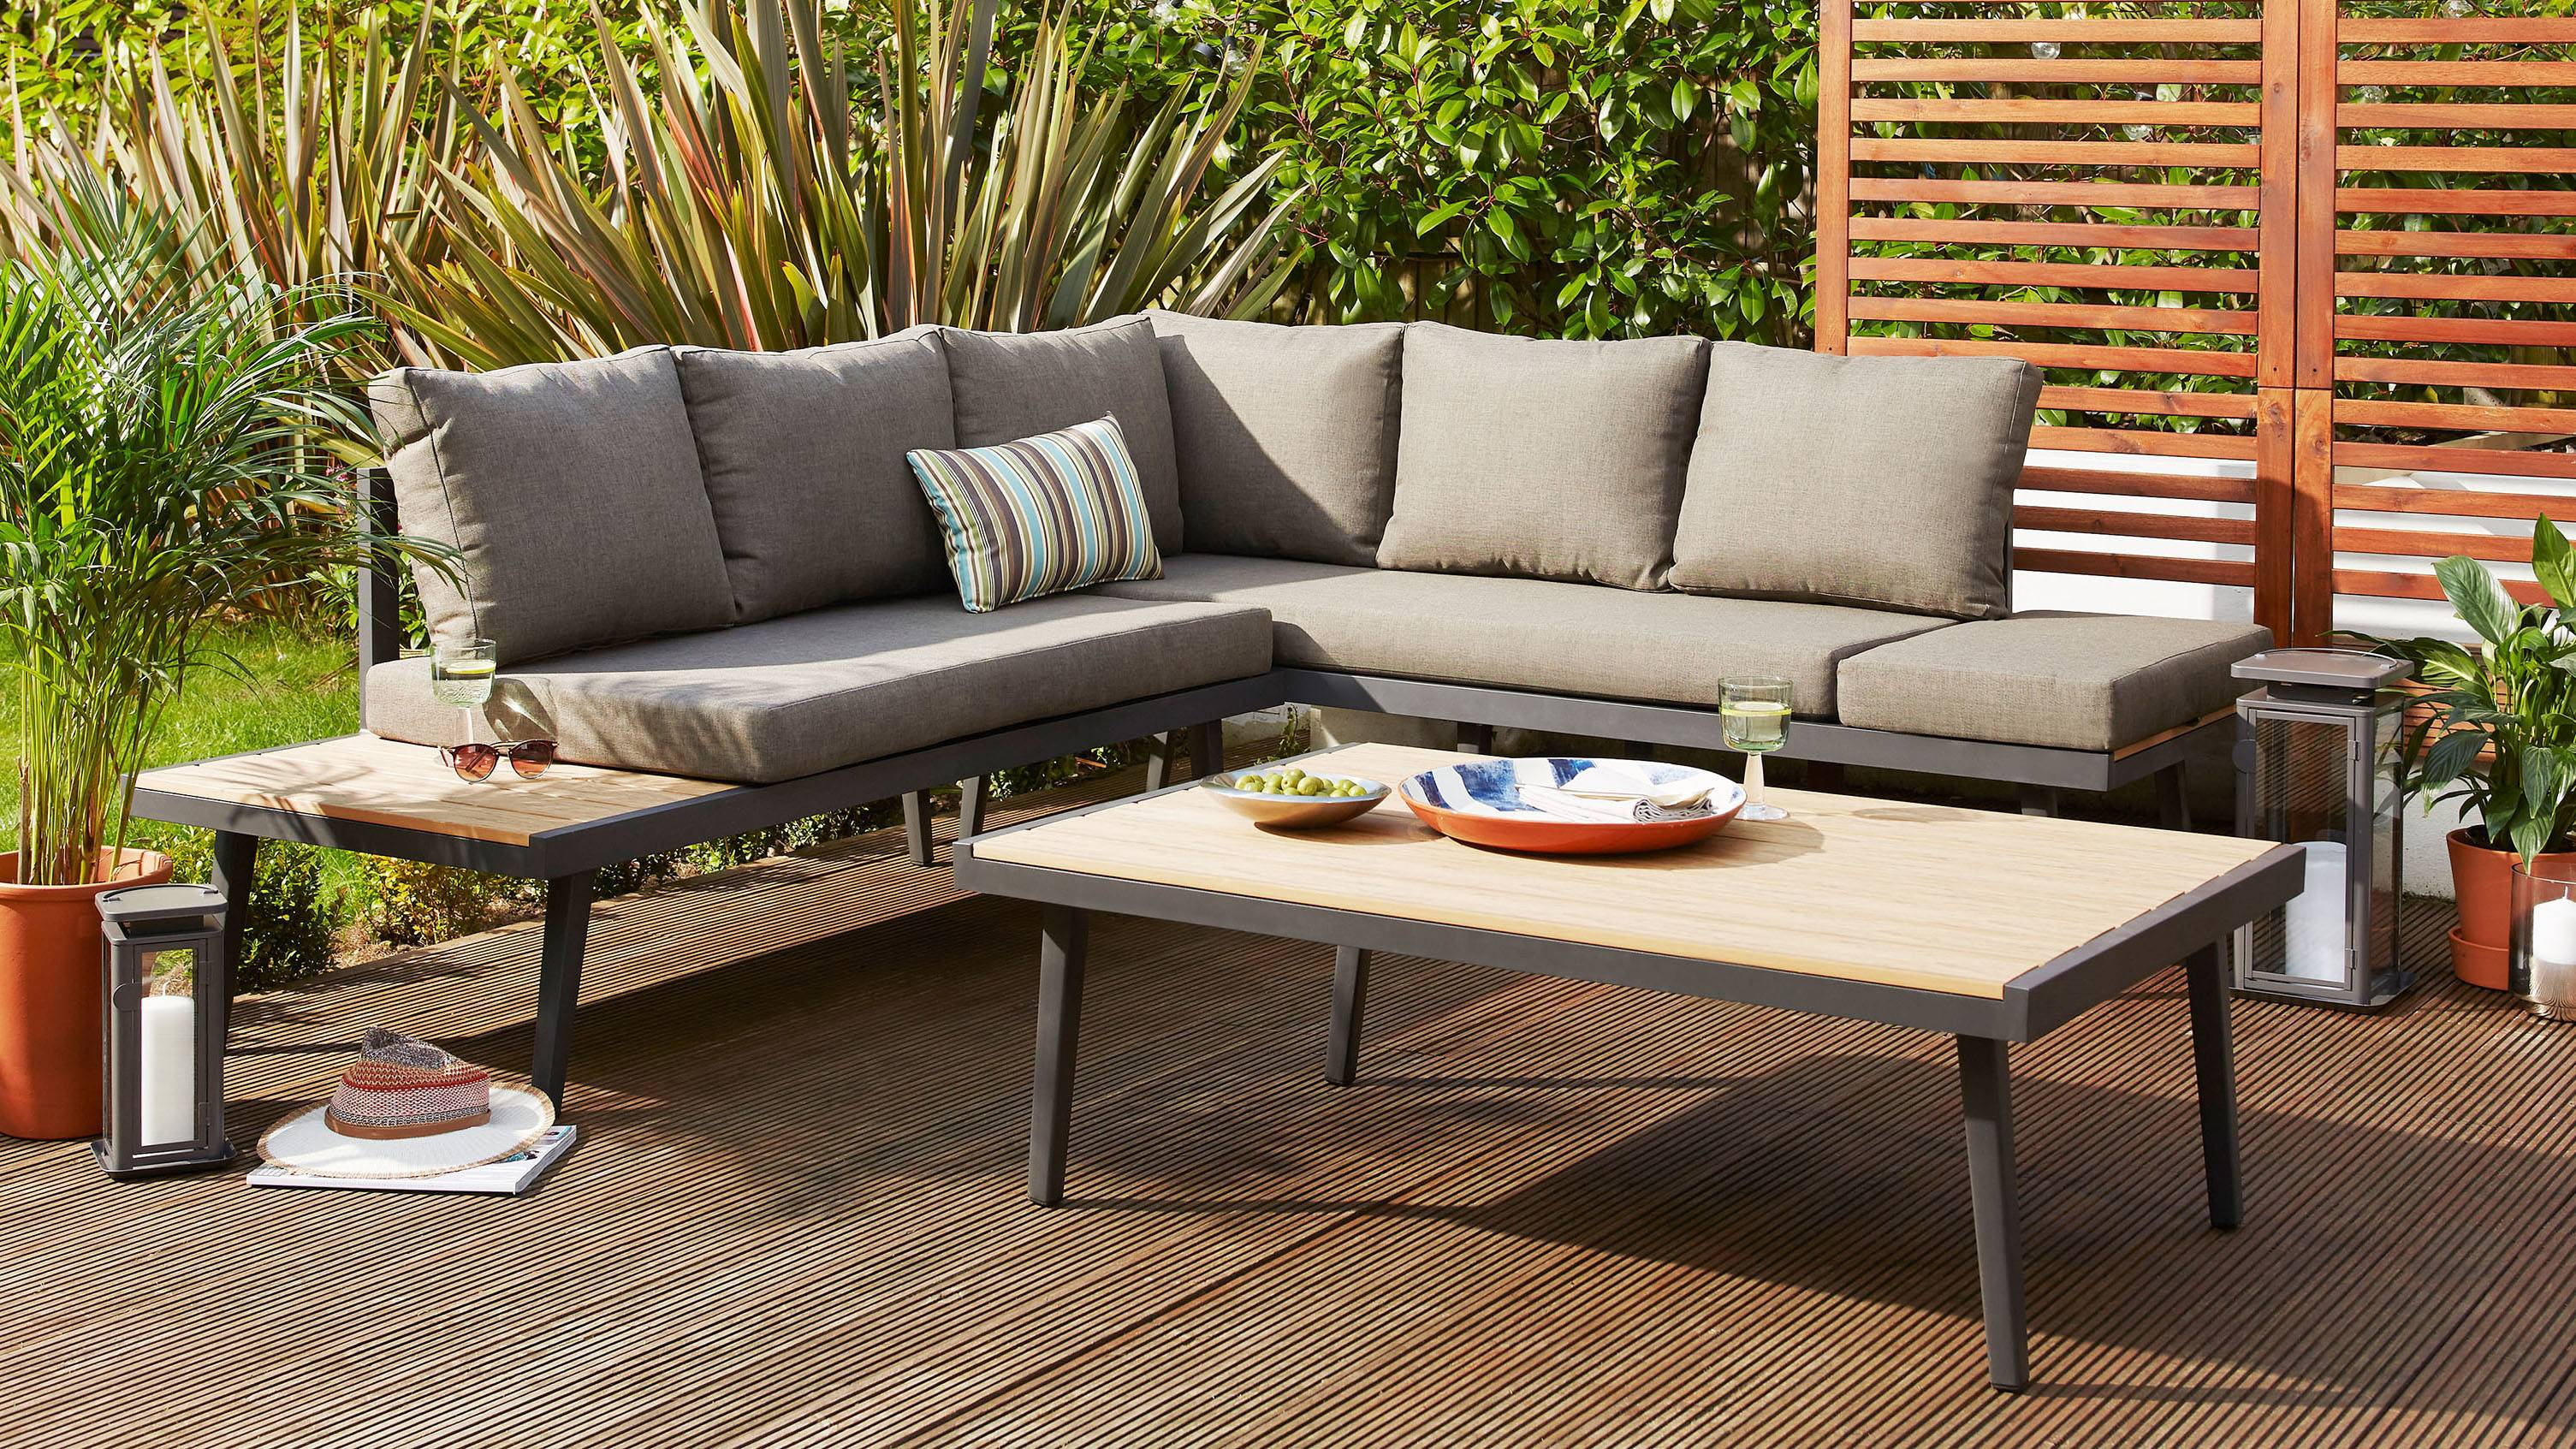 palermo-grey-left-hand-corner-outdoor-dining-bench-102x